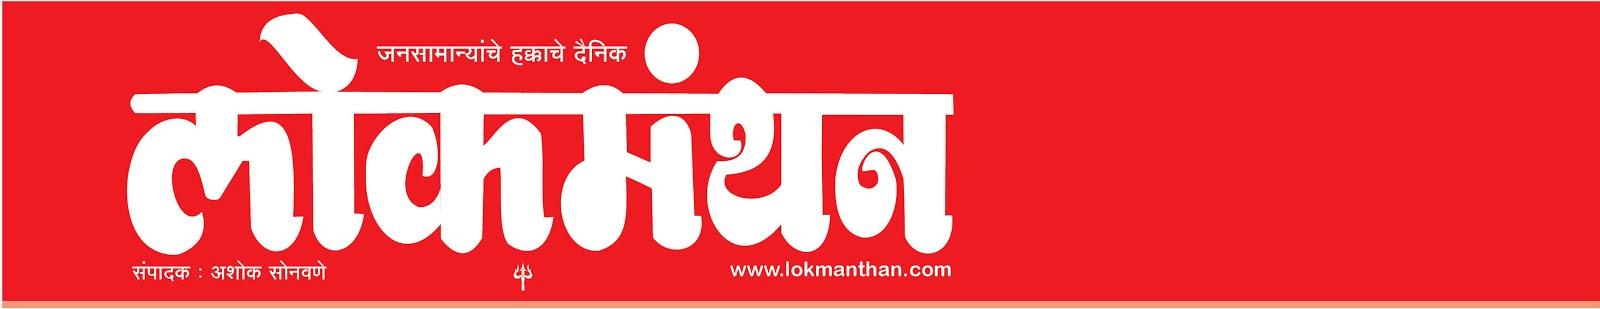 Lokmanthan.com